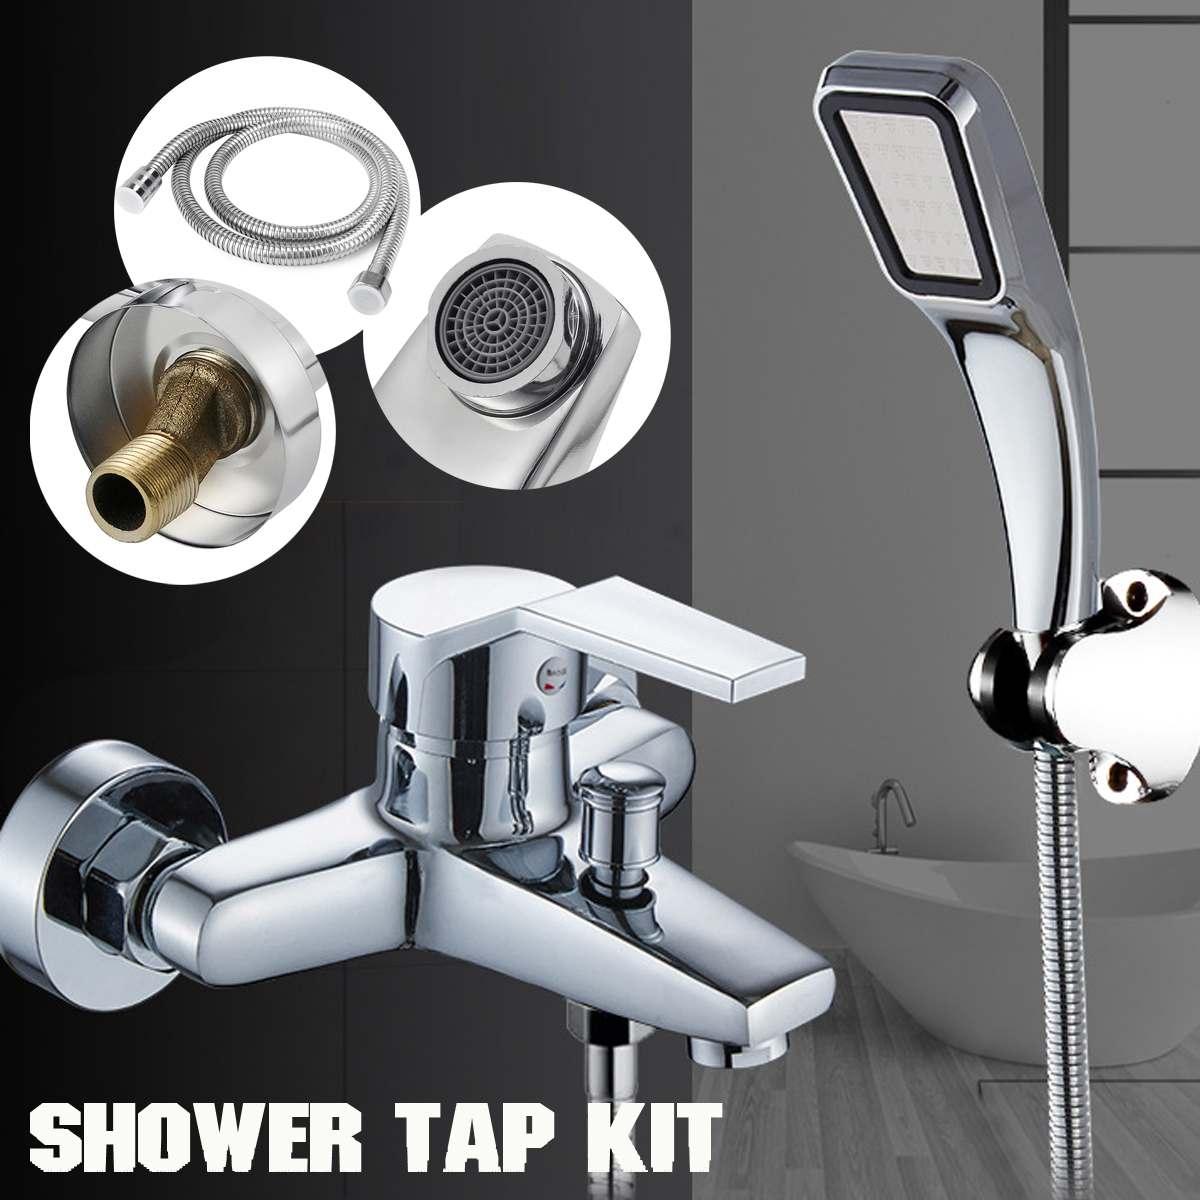 Bathtub Faucet Bath Faucet Mixer Tap Wall Mounted Hand Held Shower Head Kit Shower Faucet Sets Bath Water Mixer